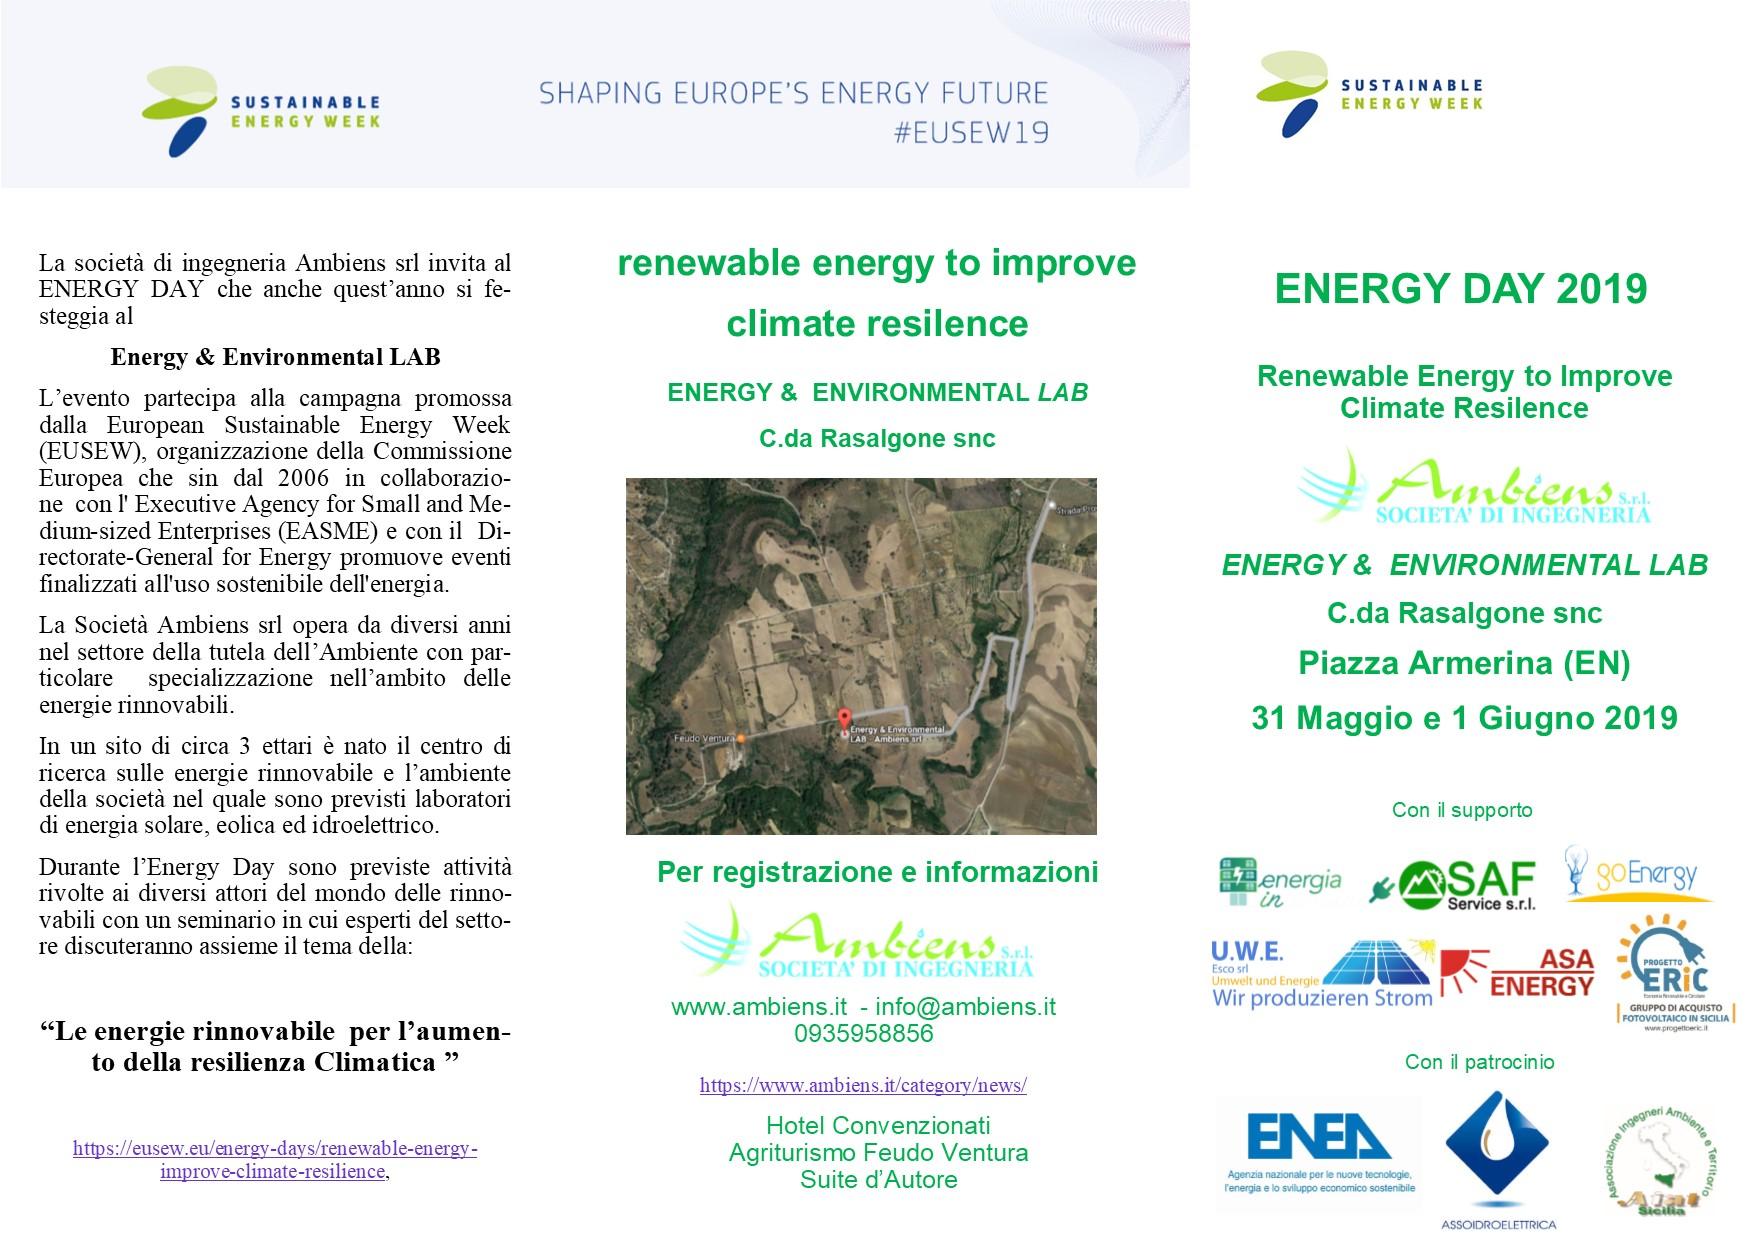 locandina energy day 2019 rev04 pag 1